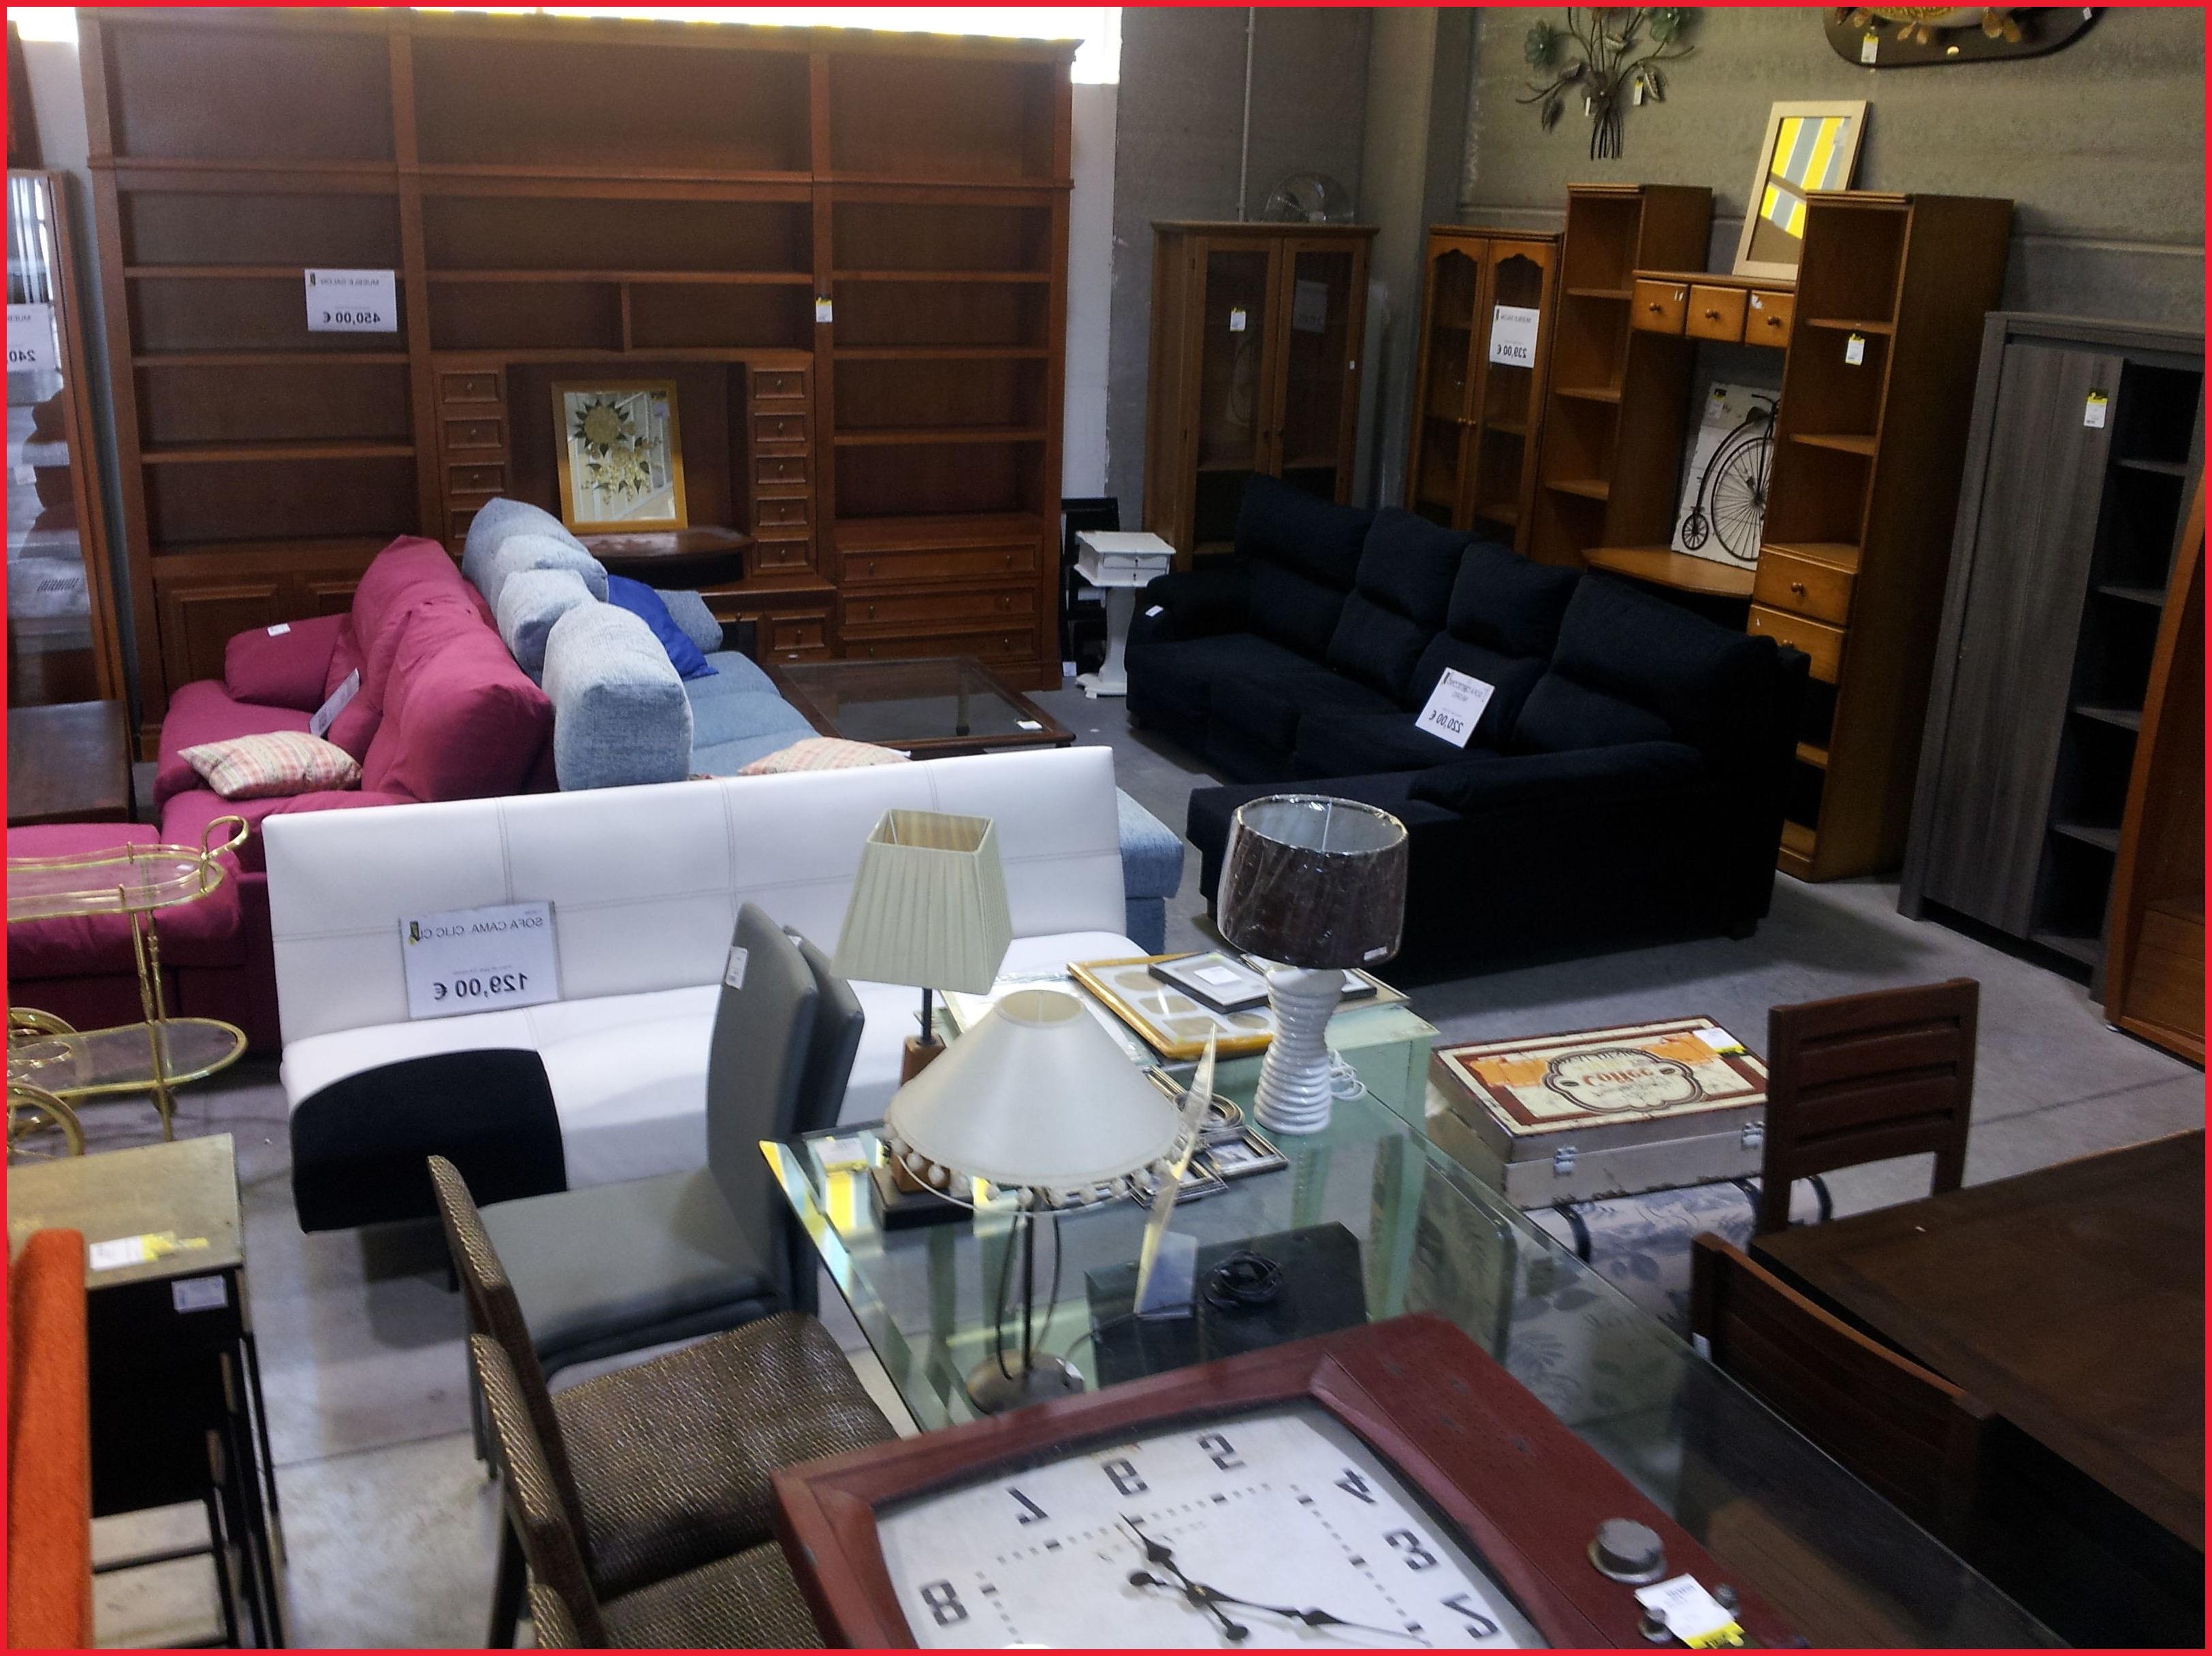 Se Compran Muebles Usados 9ddf Pra Muebles Usados Madrid Vender Muebles Usados Madrid